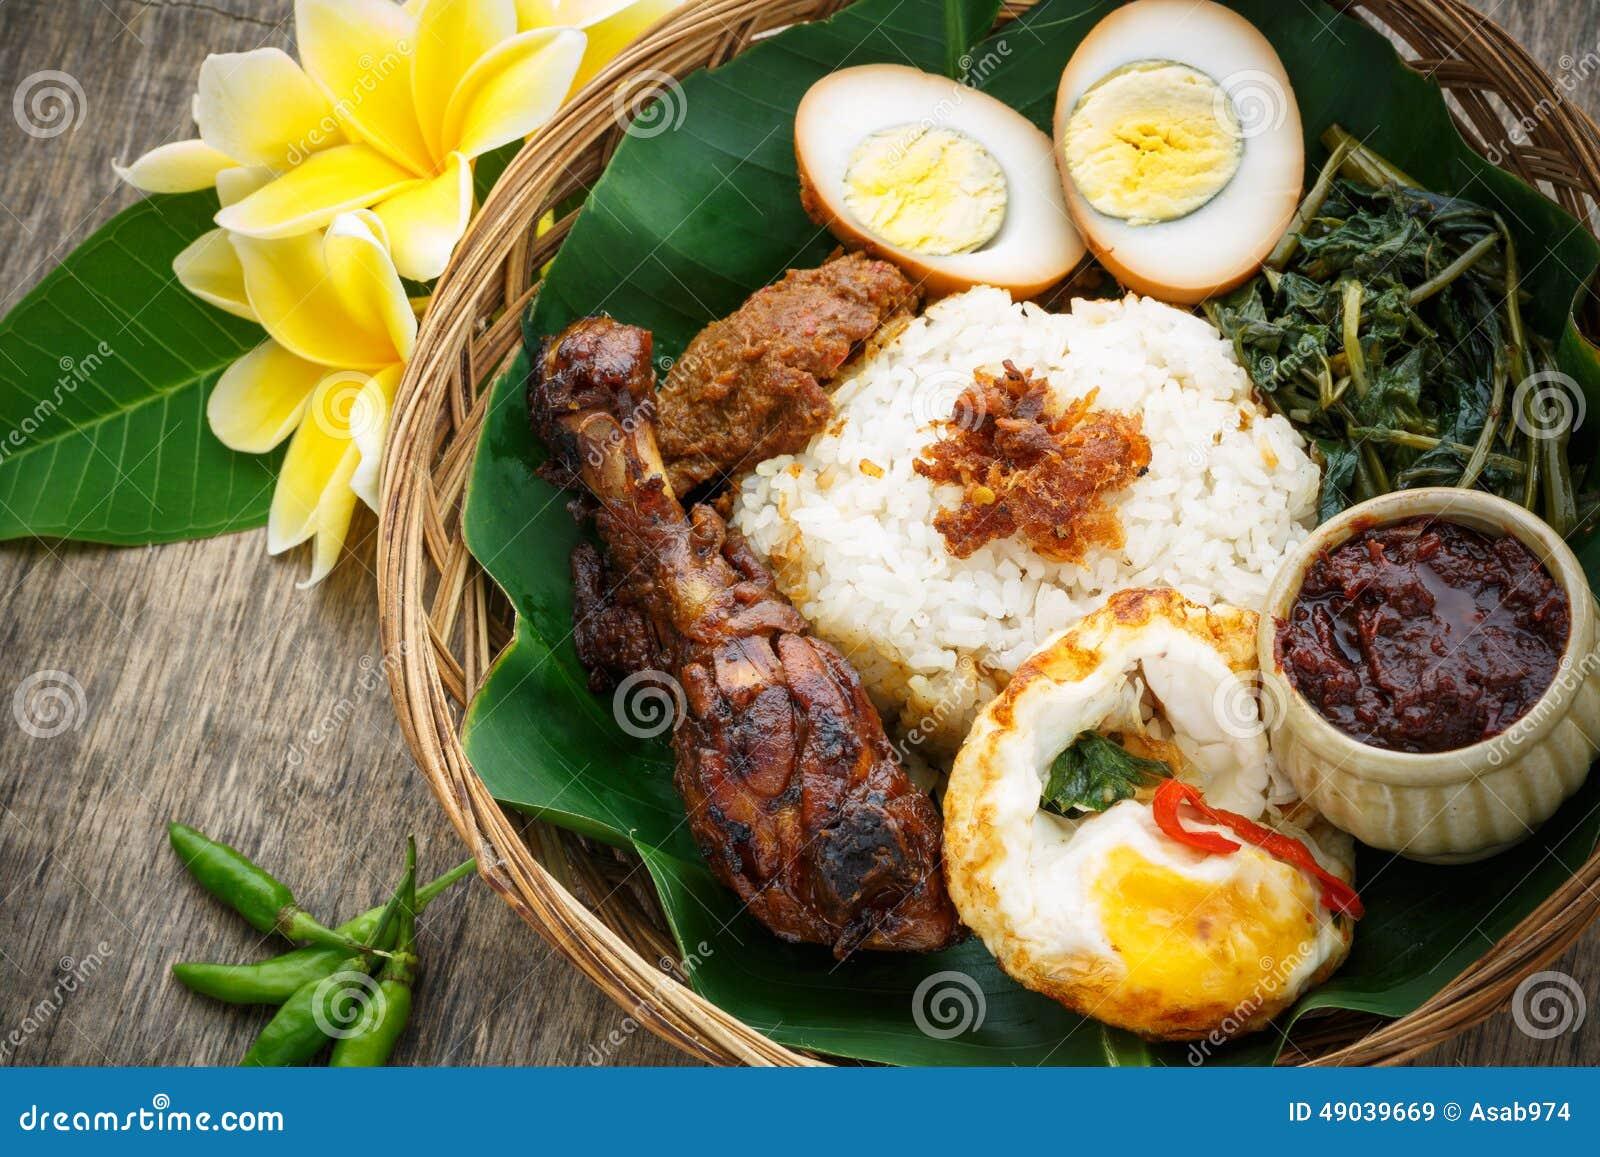 Nasi Campur, индонезийская еда